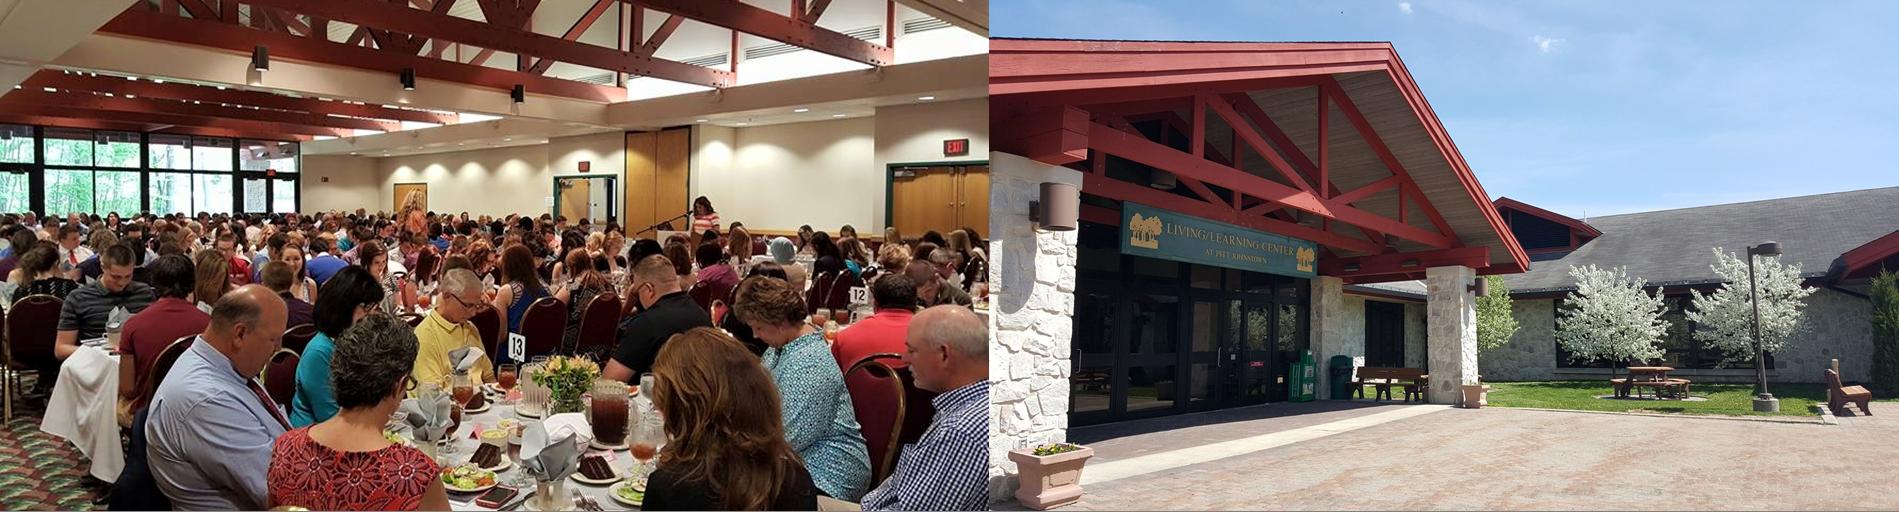 Visit Johnstown Pa | UPJ Conference Center